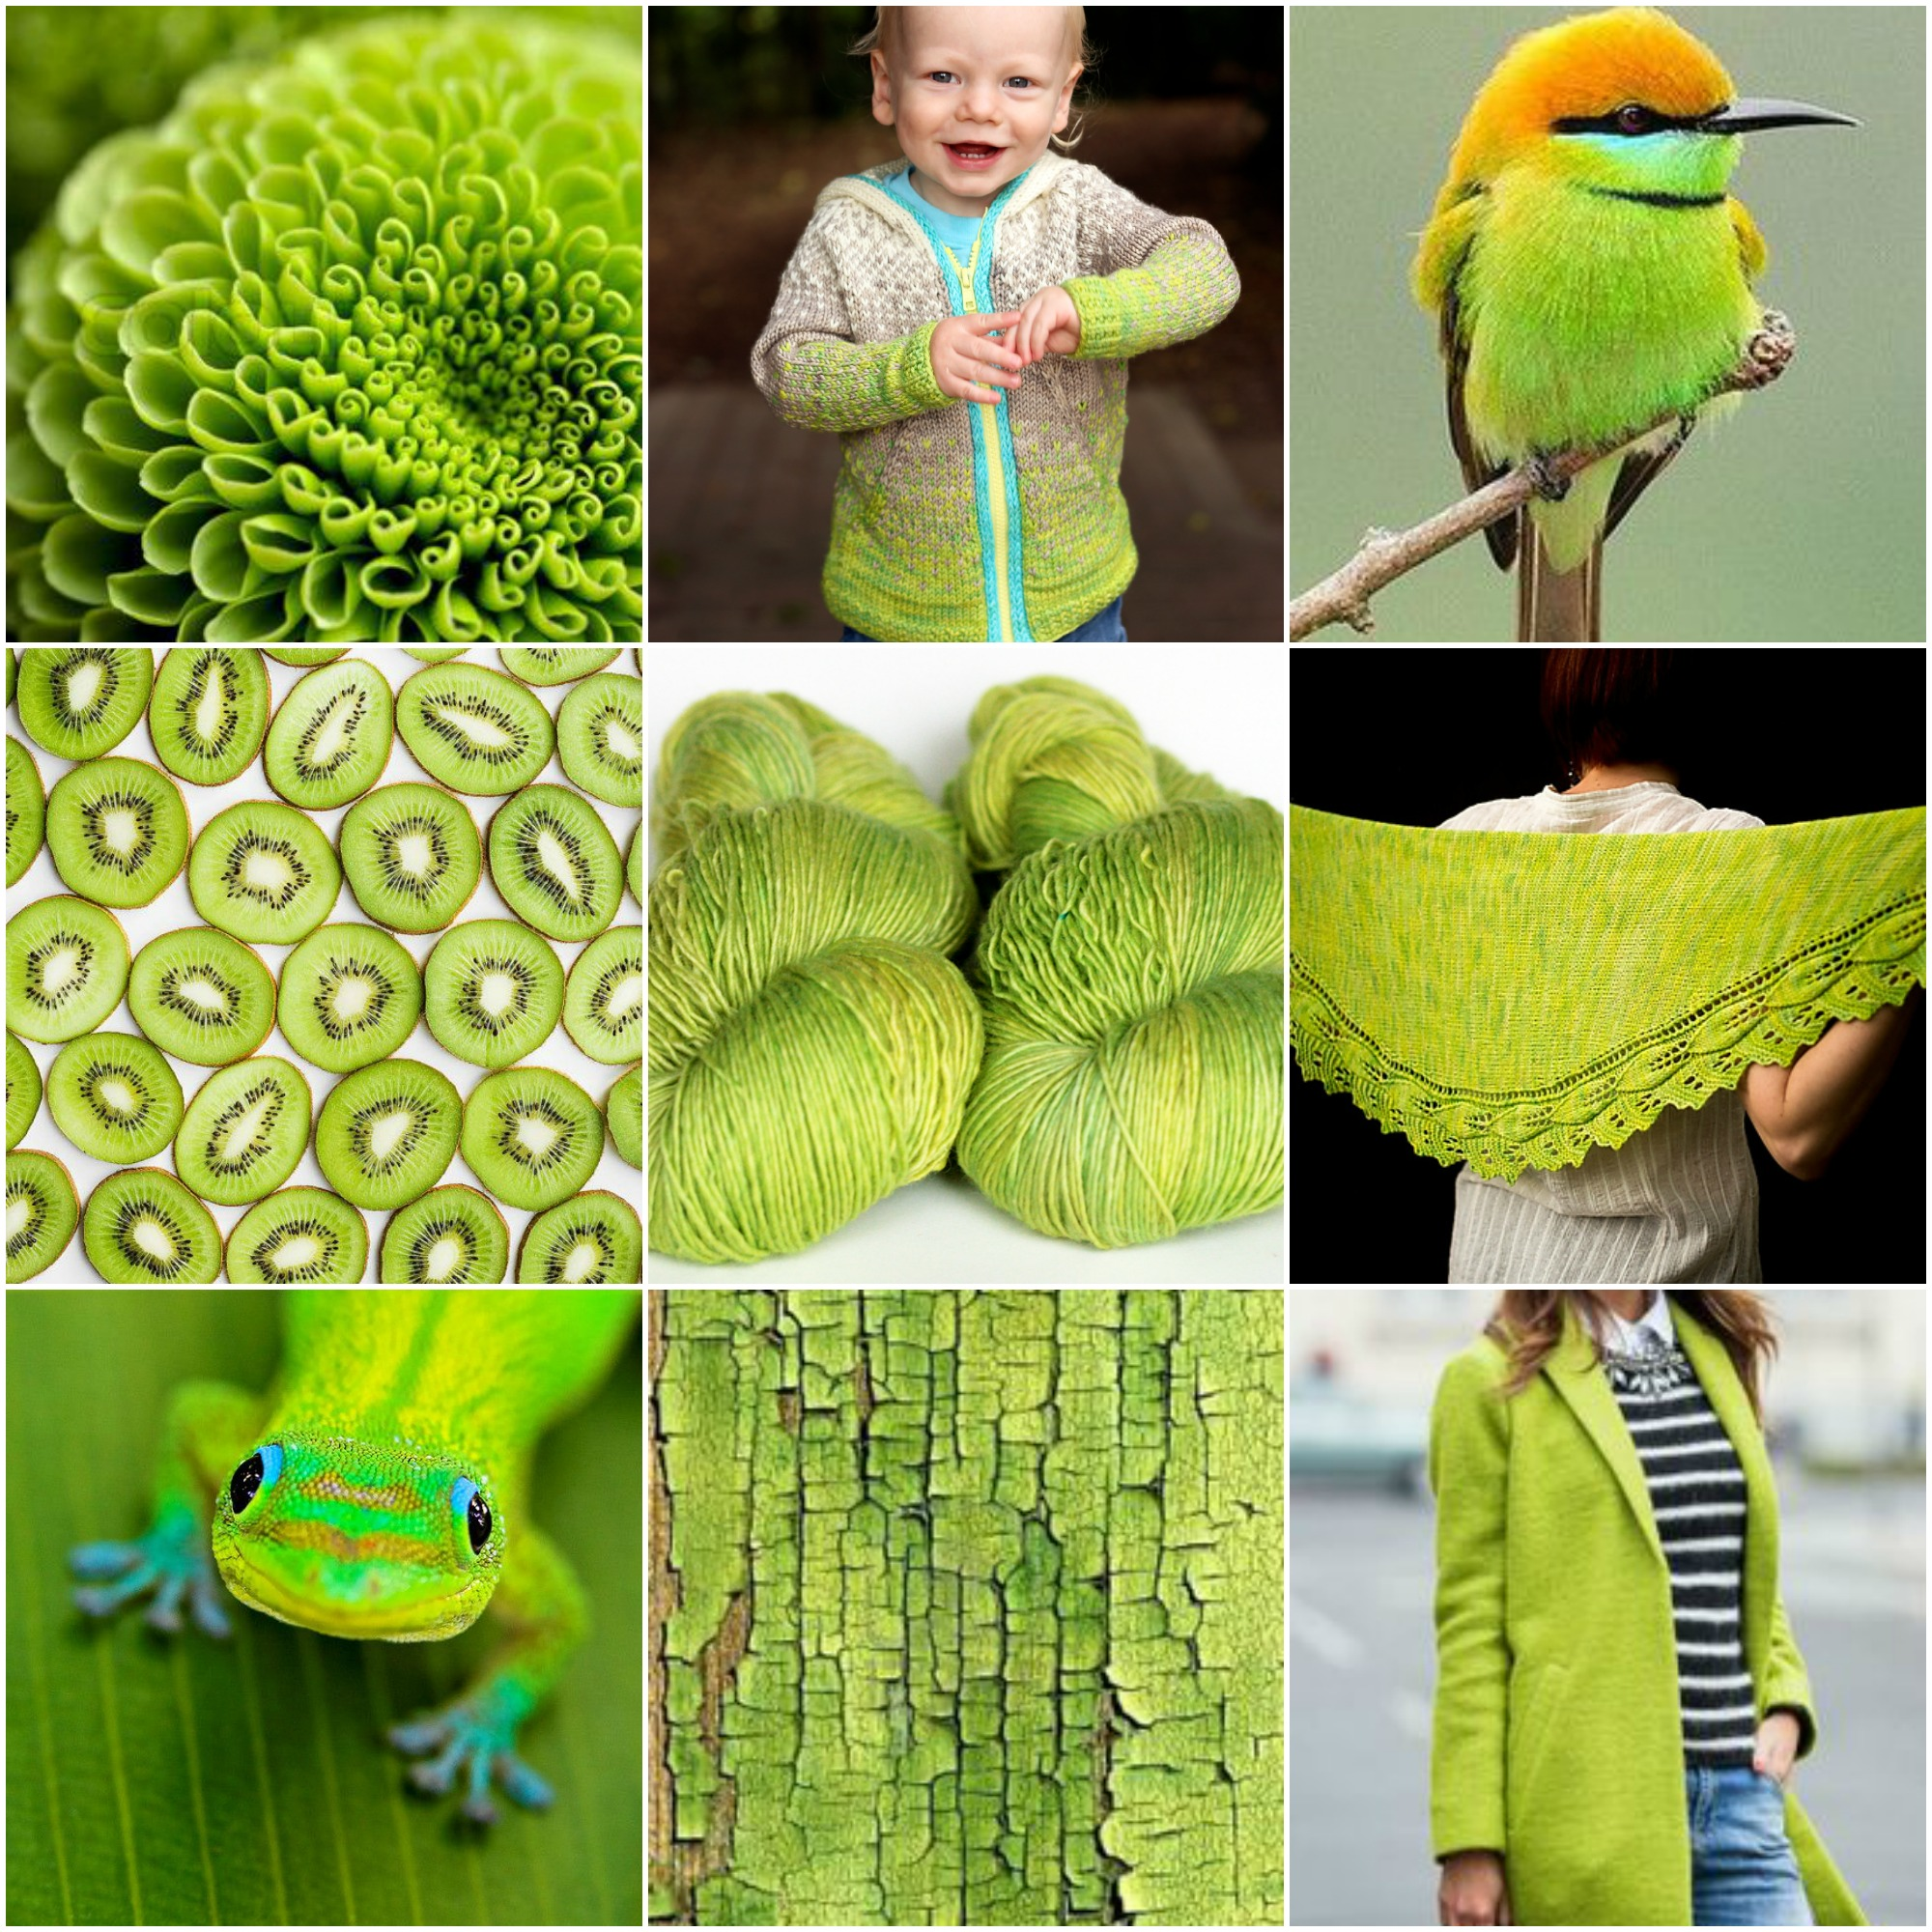 flower , Rowan's R&R Hoodie , bird , kiwis , TFA Red Label Cashmere/Silk SIngles in Lemongrass , On The Move shawl . salamander , crackled paint , jacket .